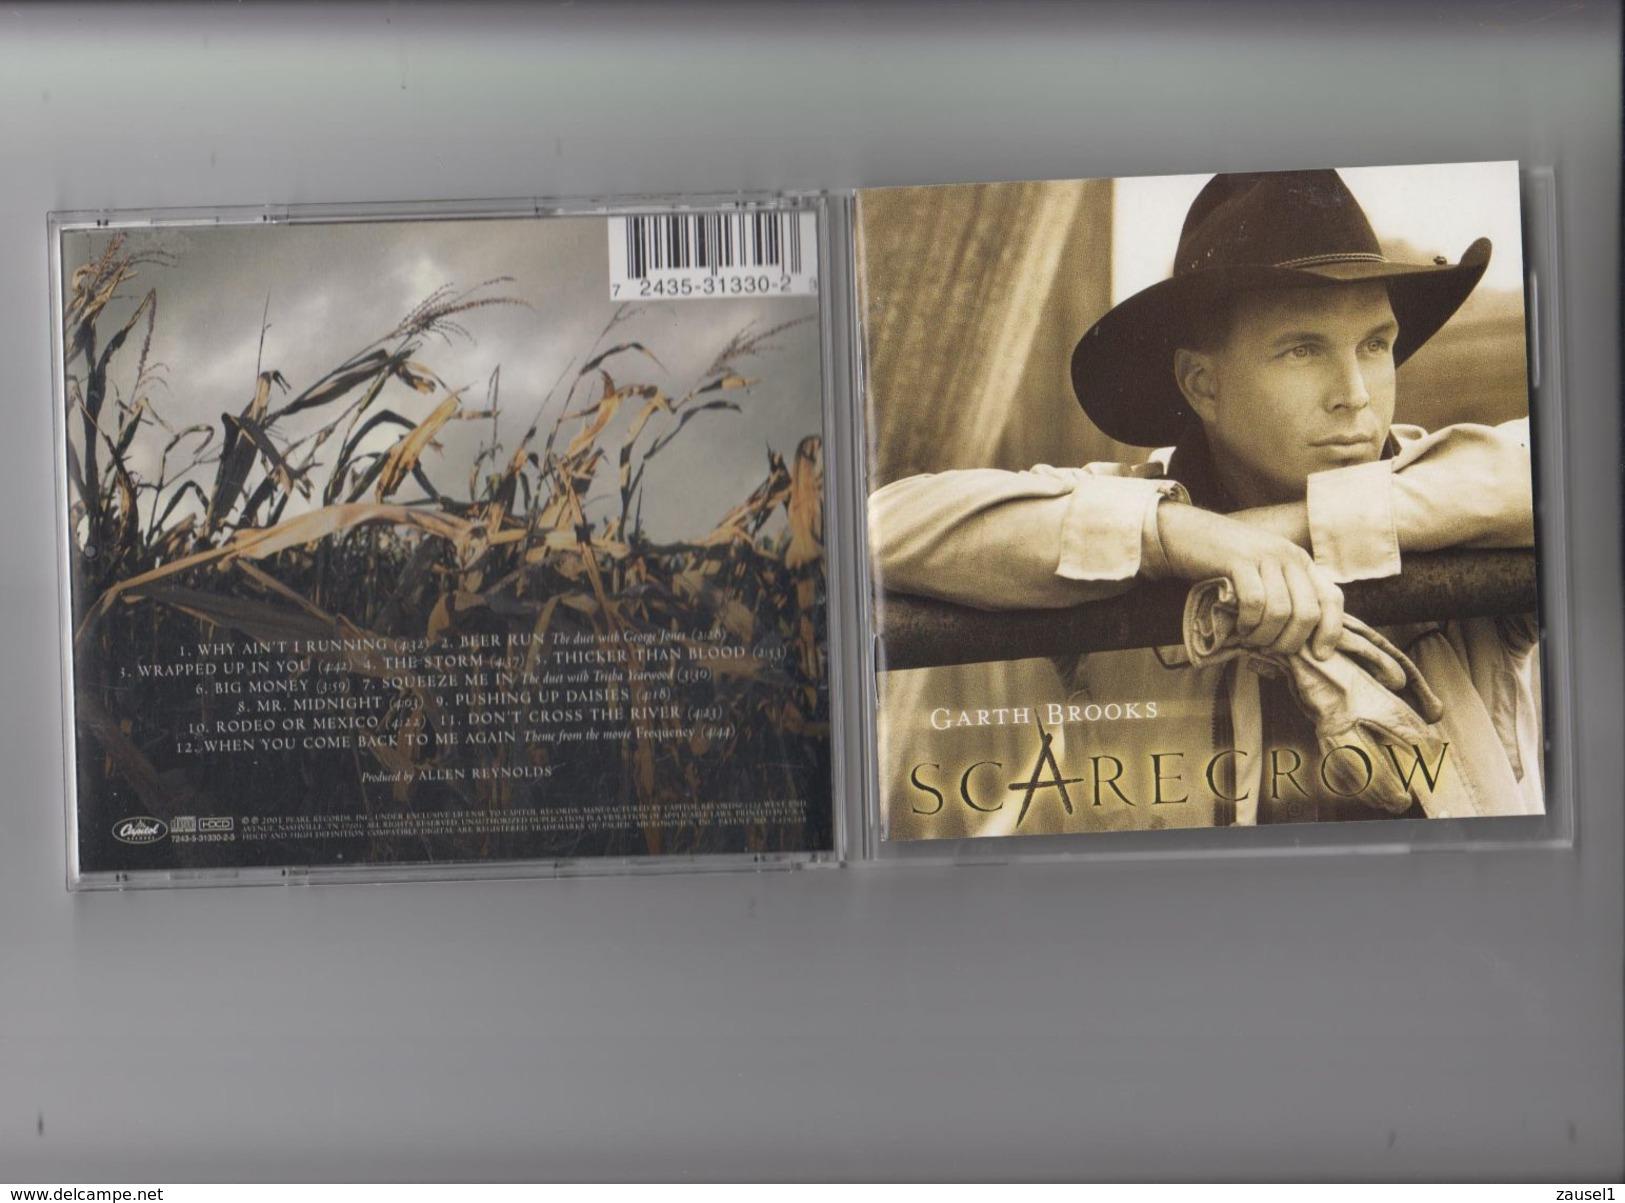 Garth Brooks - Scarecrow - Original CD - Country & Folk